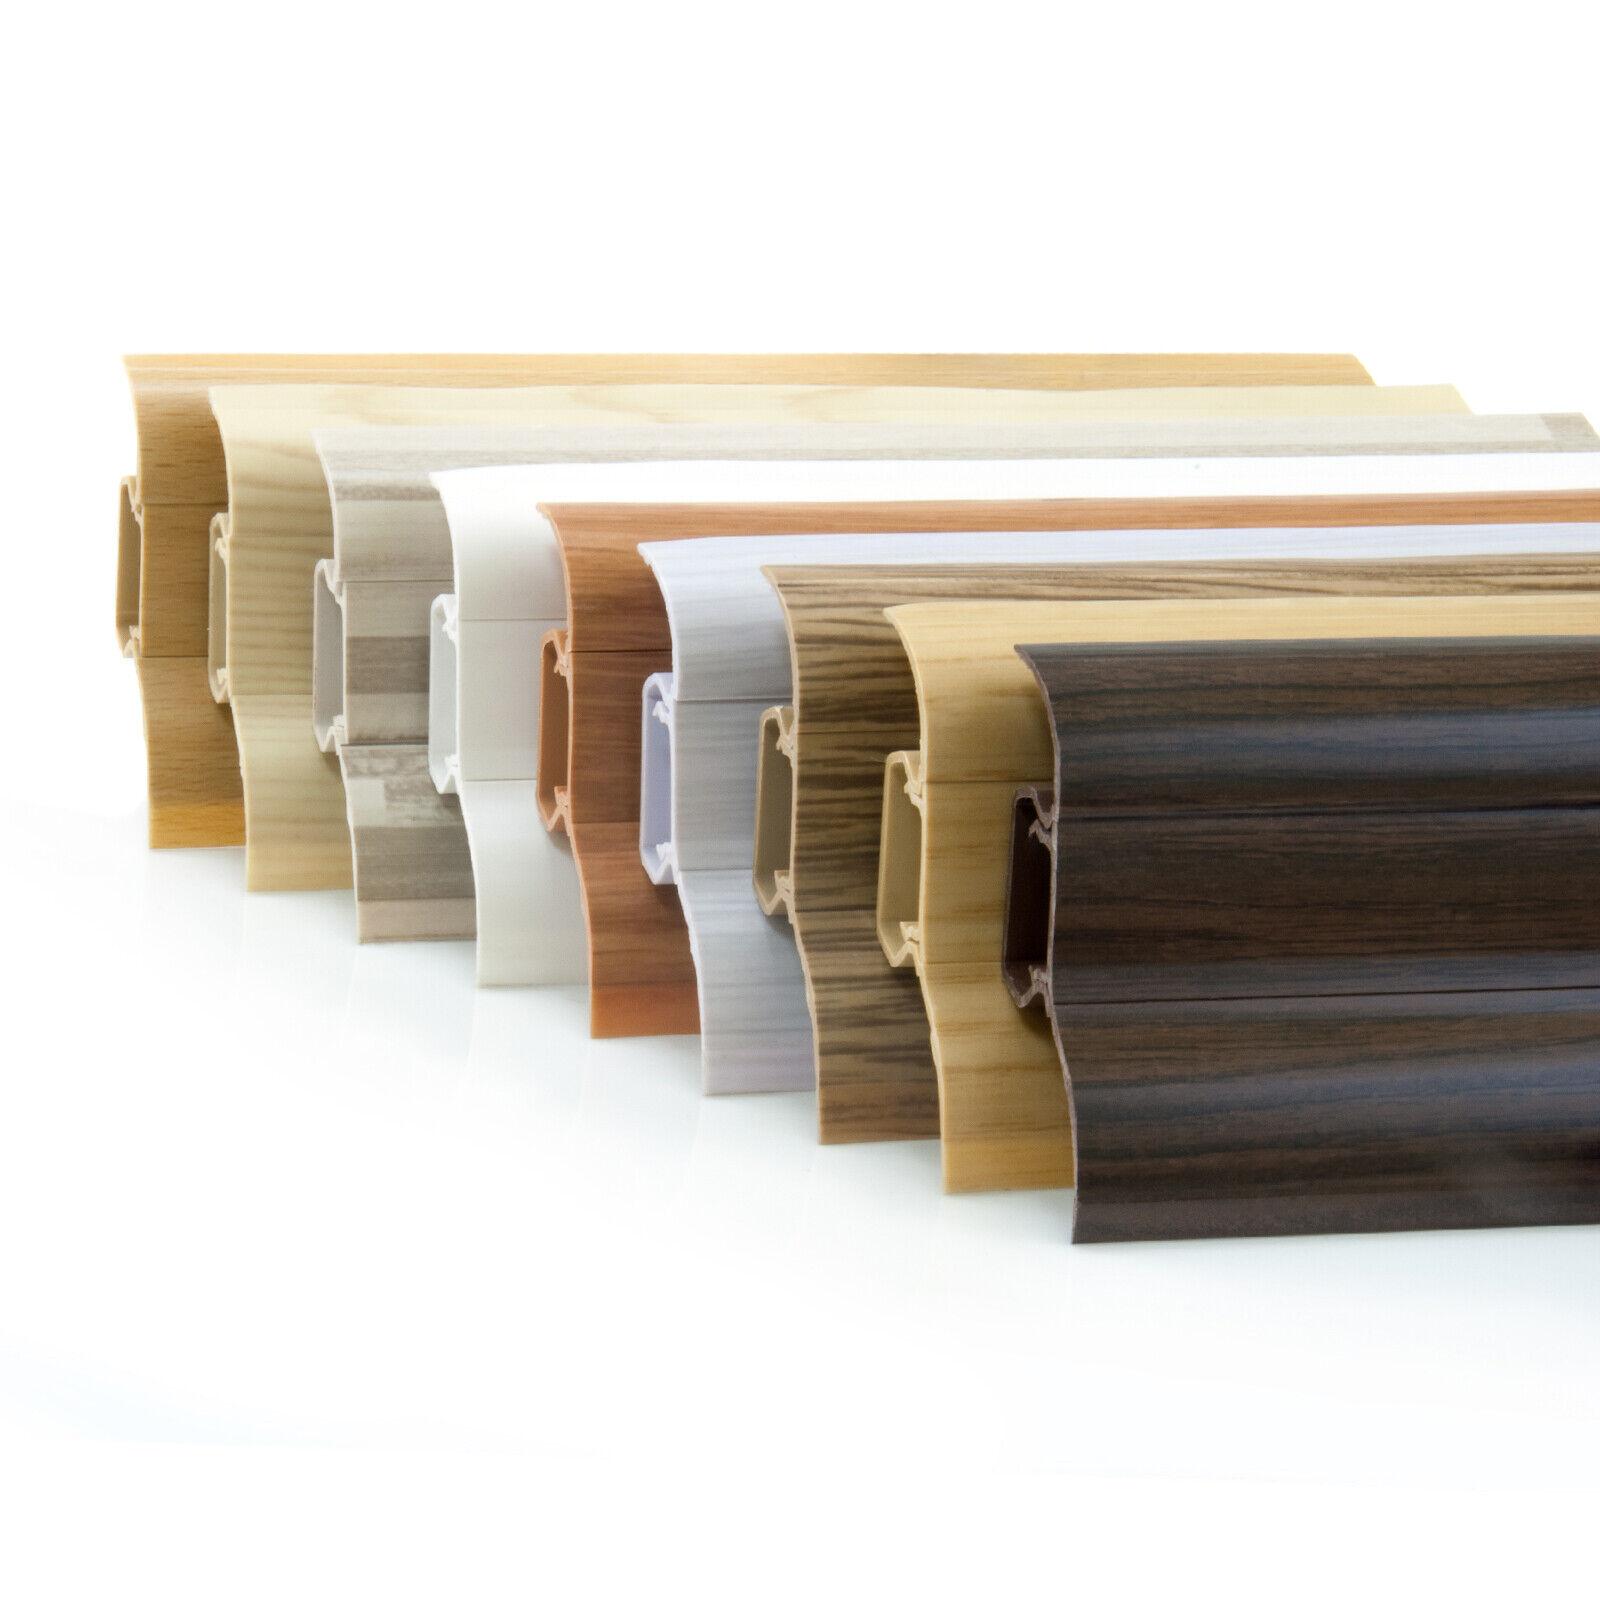 200cm Sockelleisten Laminatleisten Kunststoff PVC Leisten 52mm Weiß Fußleiste